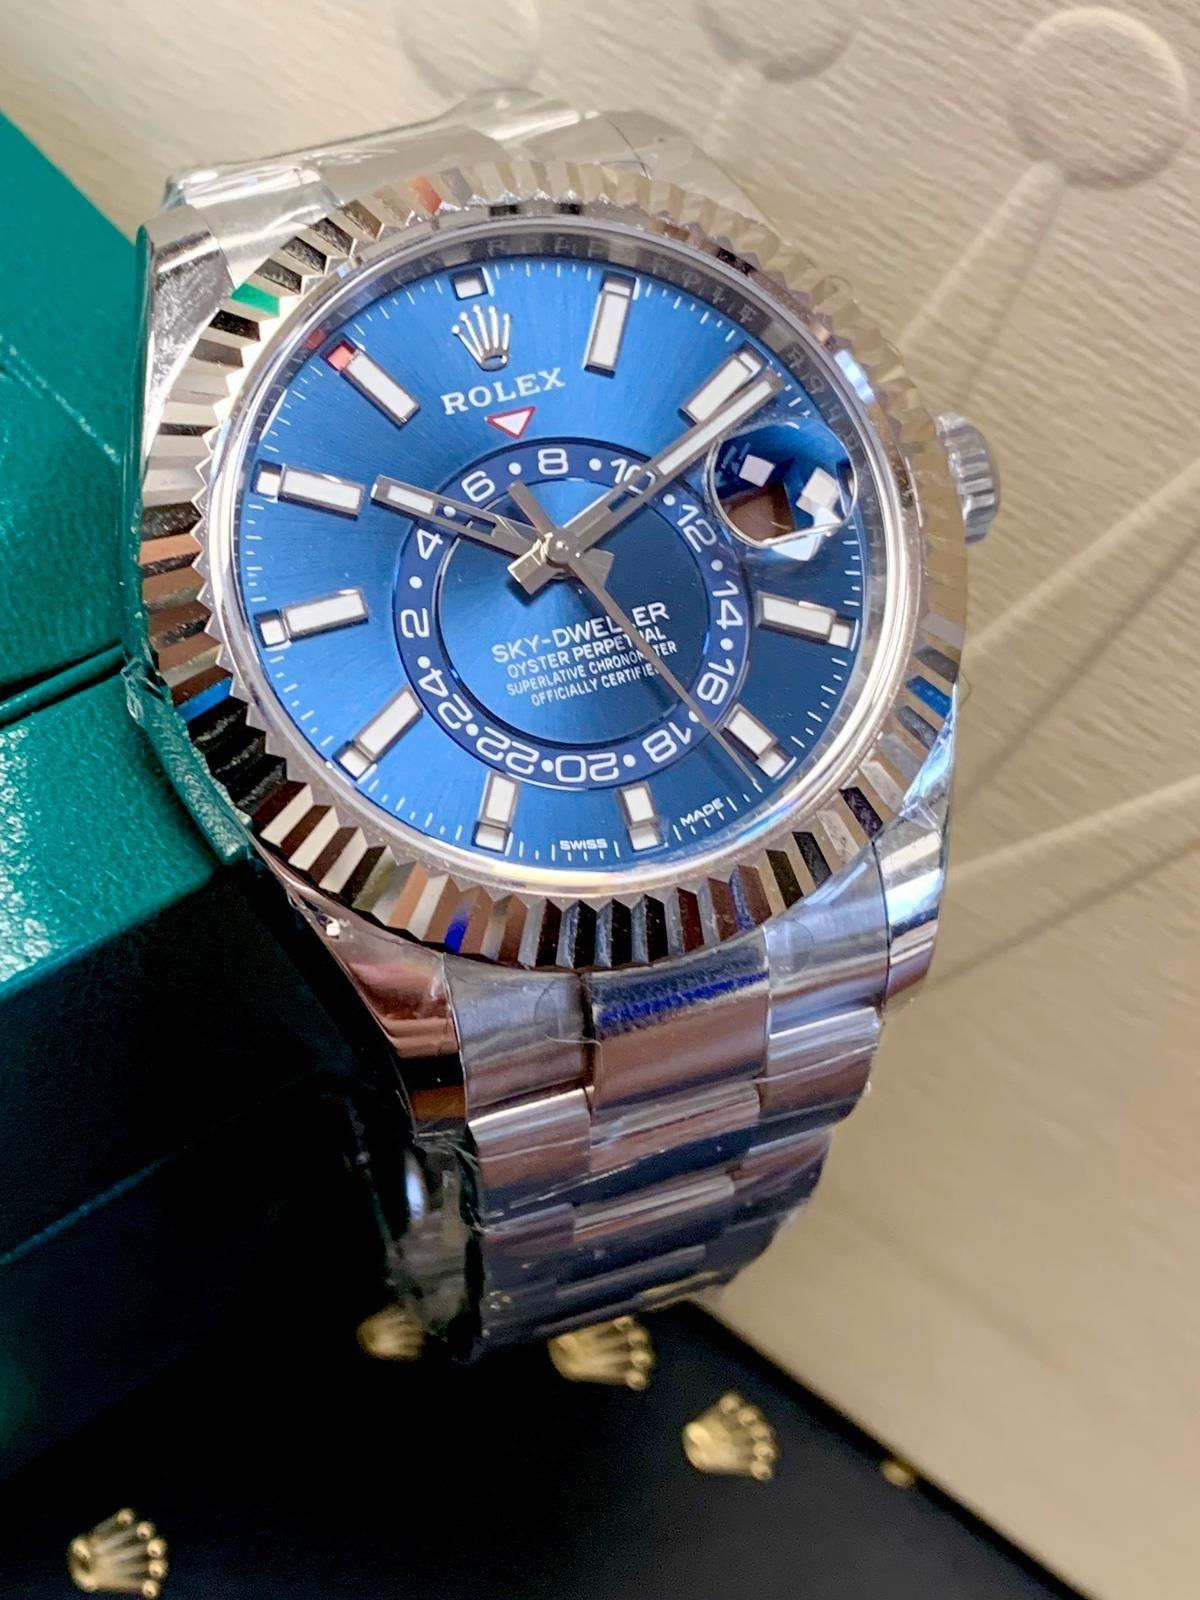 Rolex Sky-Dweller Stainless Steel Blue Dial 326934